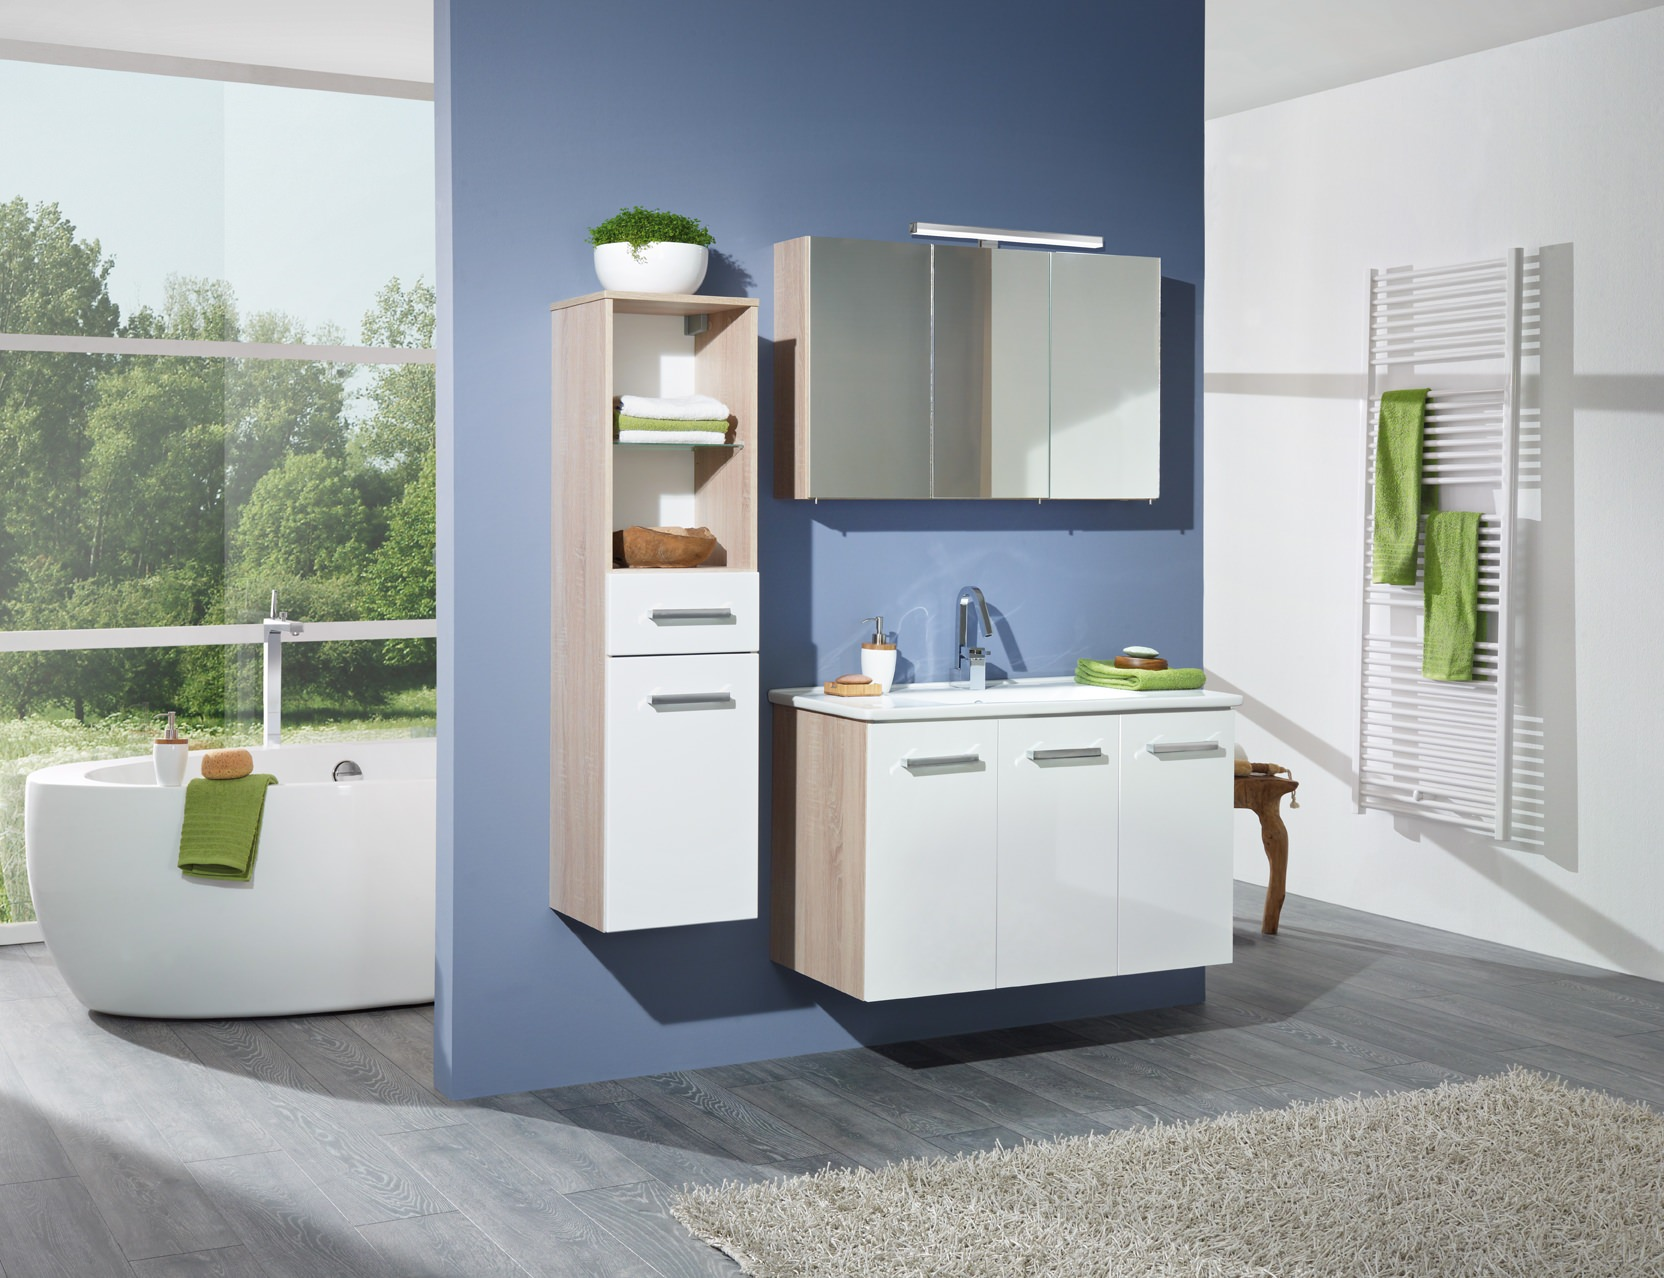 e zoll simply santos waschplatz 100cm sonoma eiche s grau dekor wei hochglanz 83209. Black Bedroom Furniture Sets. Home Design Ideas